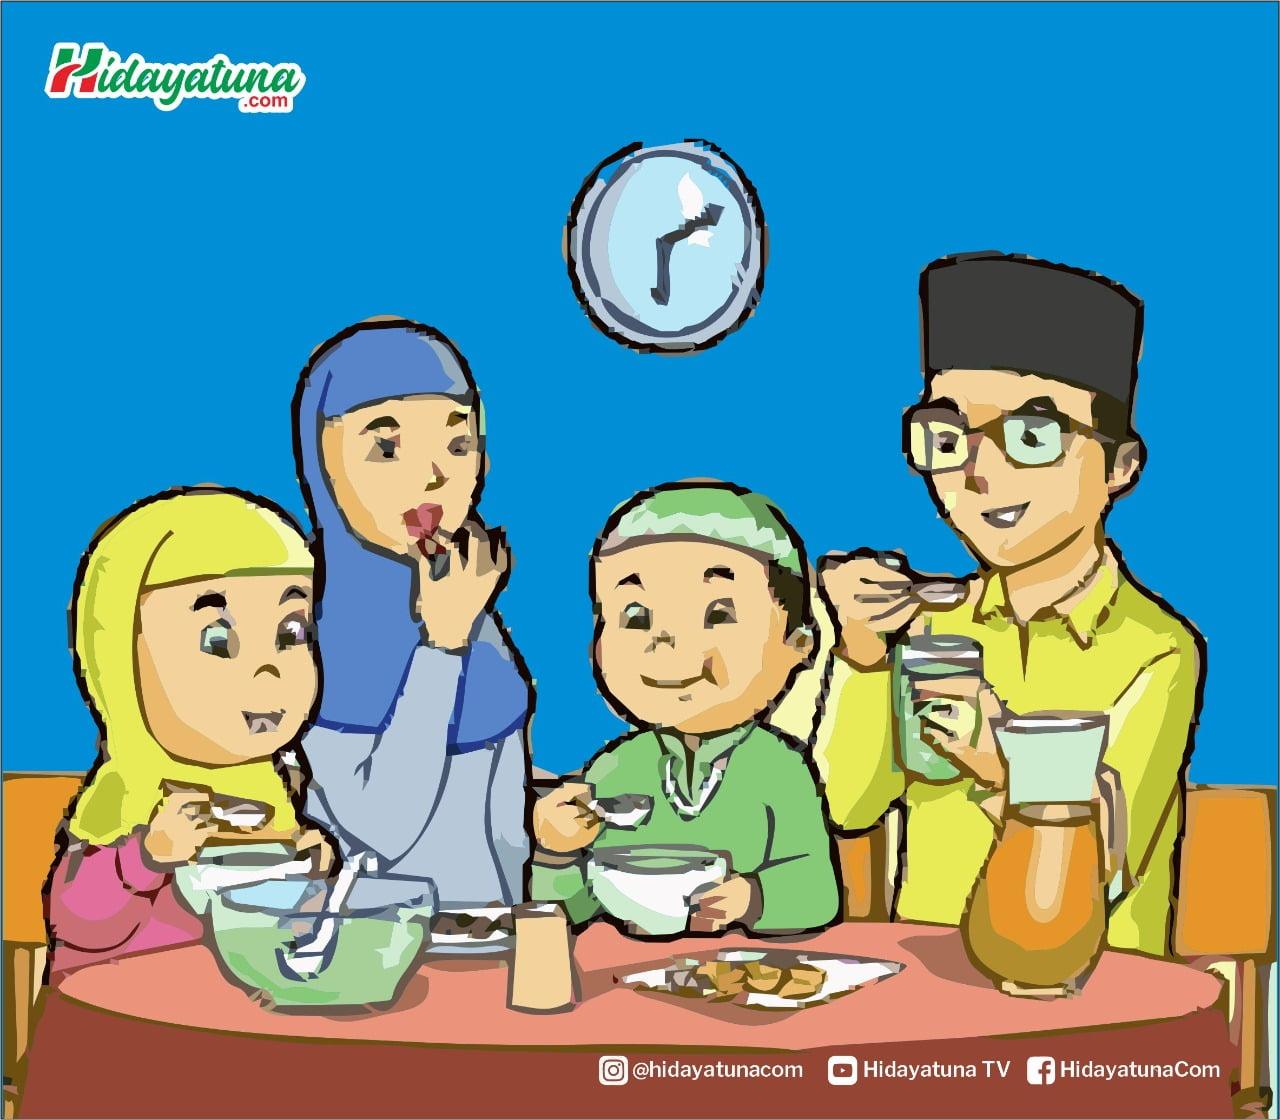 Membangun keluarga yang harmonis (Ilustrasi/Hidayatuna)